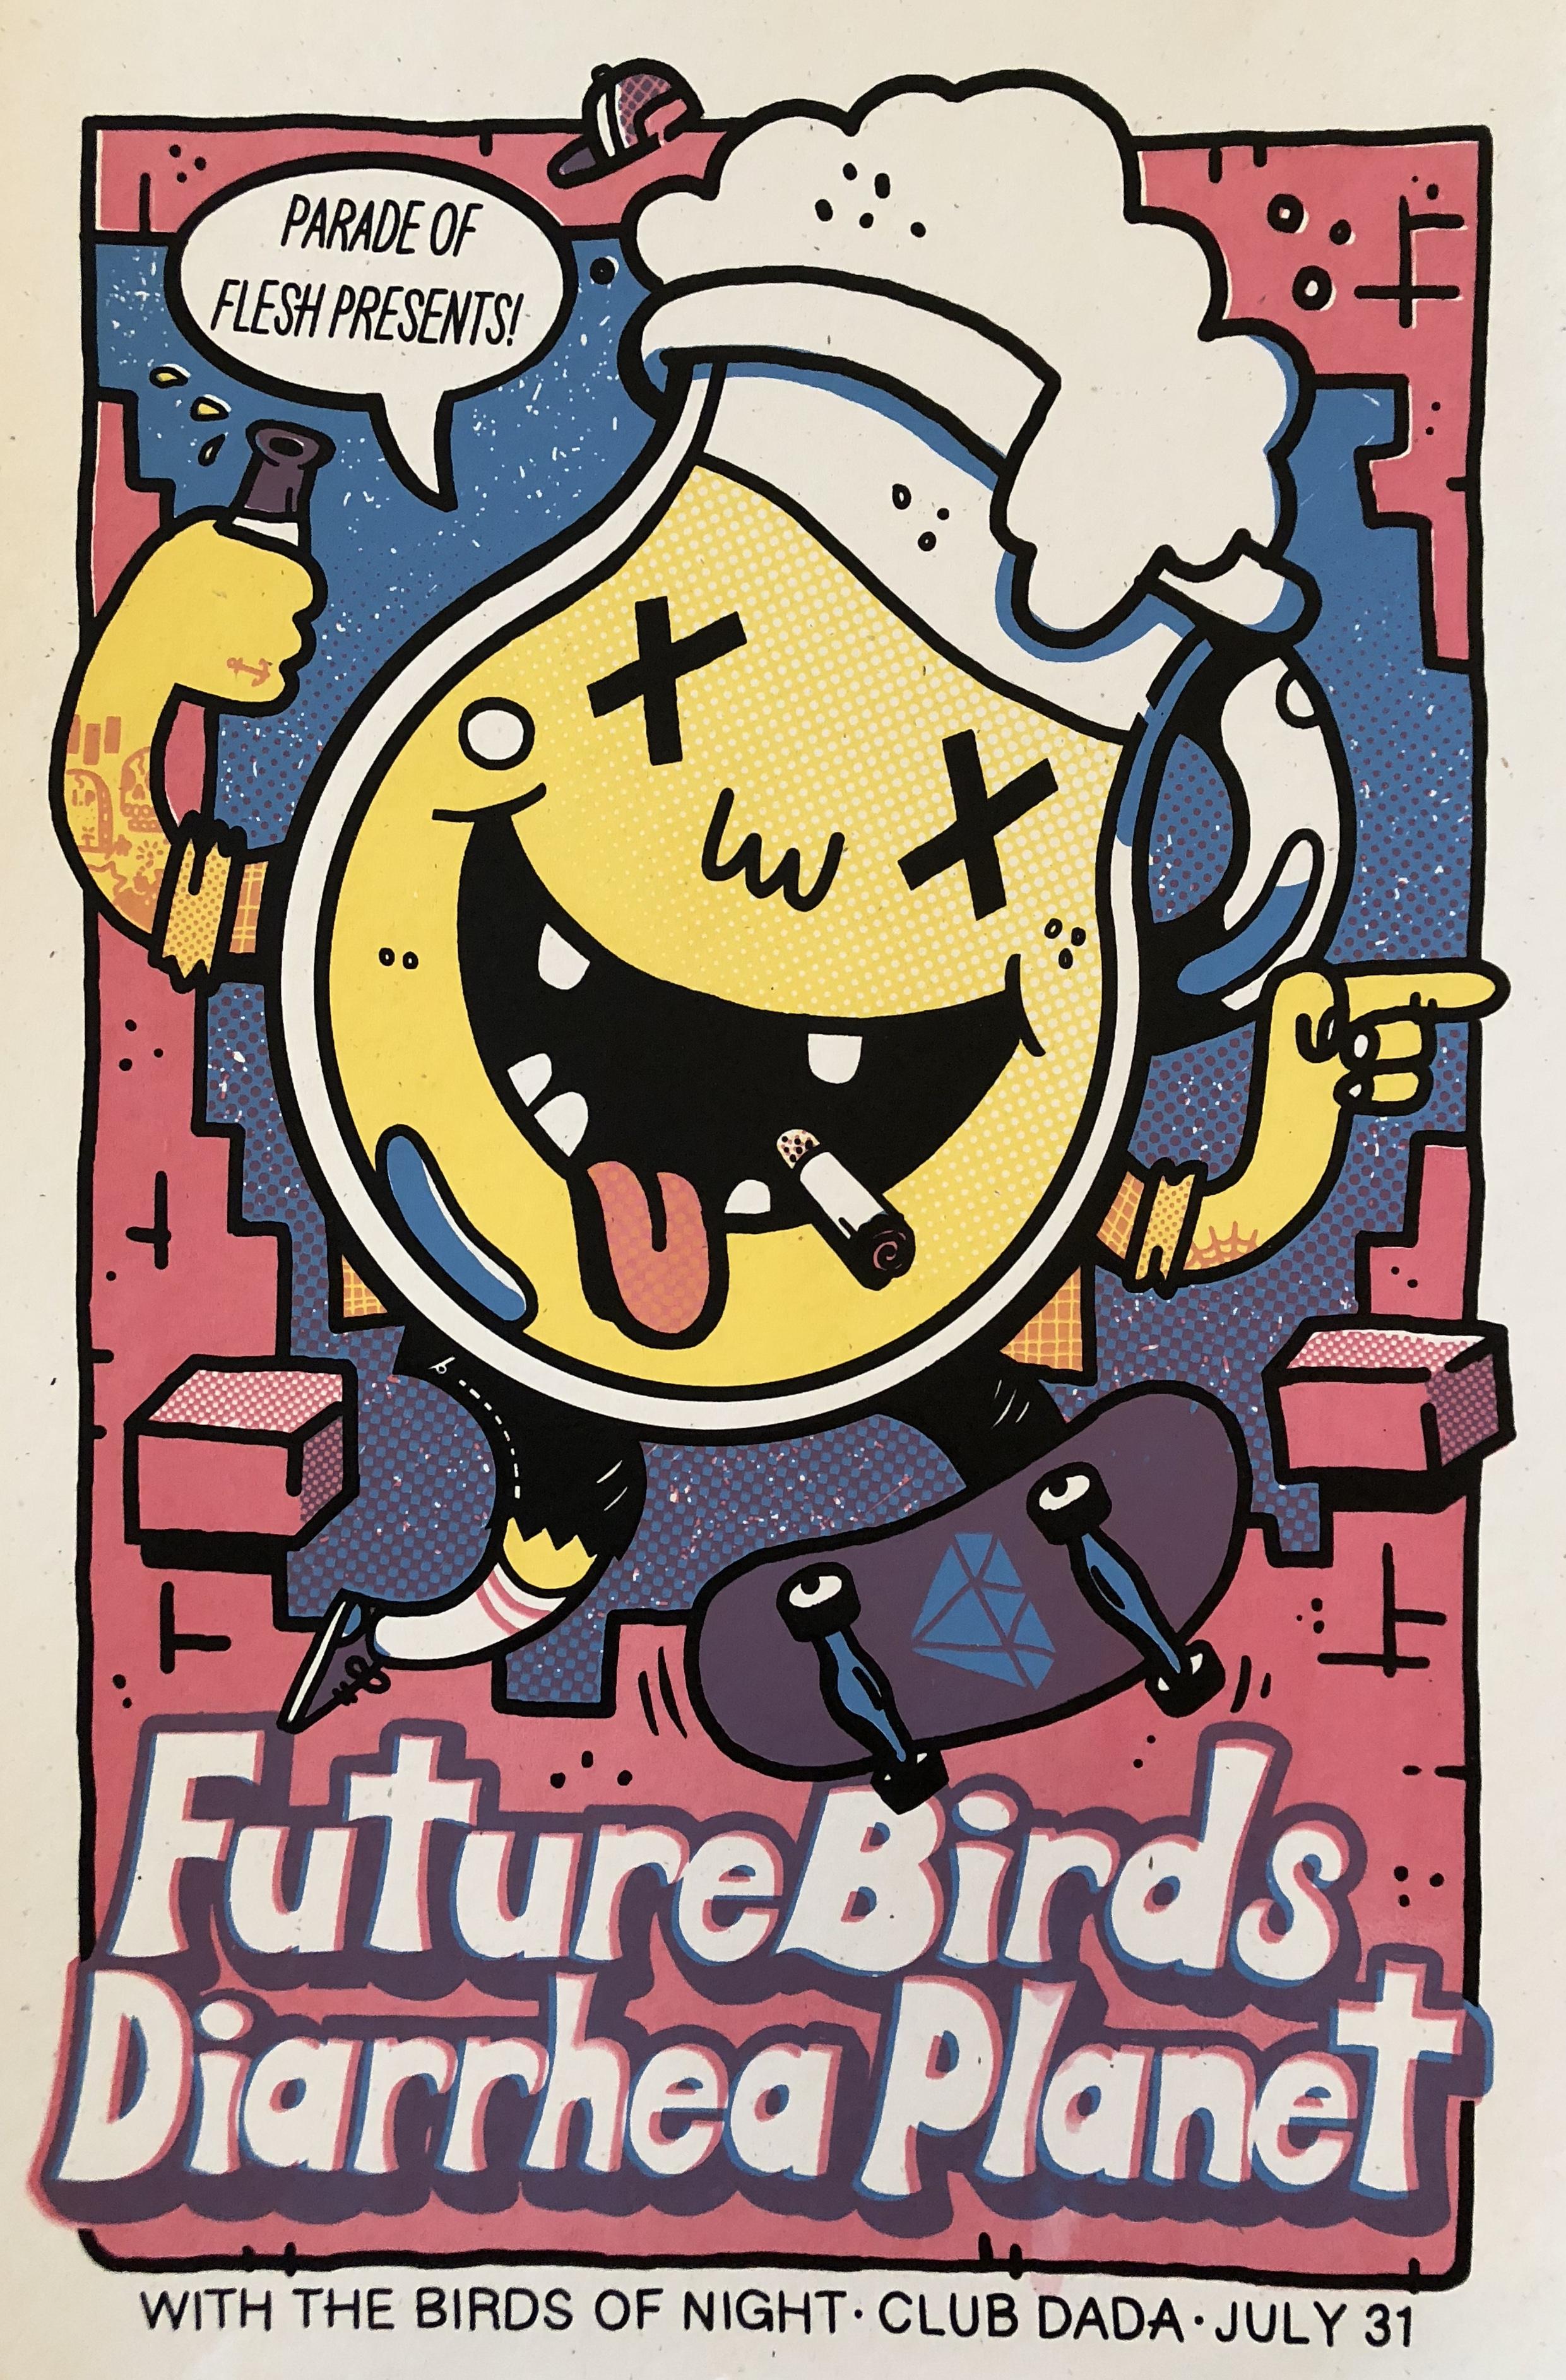 Diarrhea Planet, Futurebirds at Club Dada